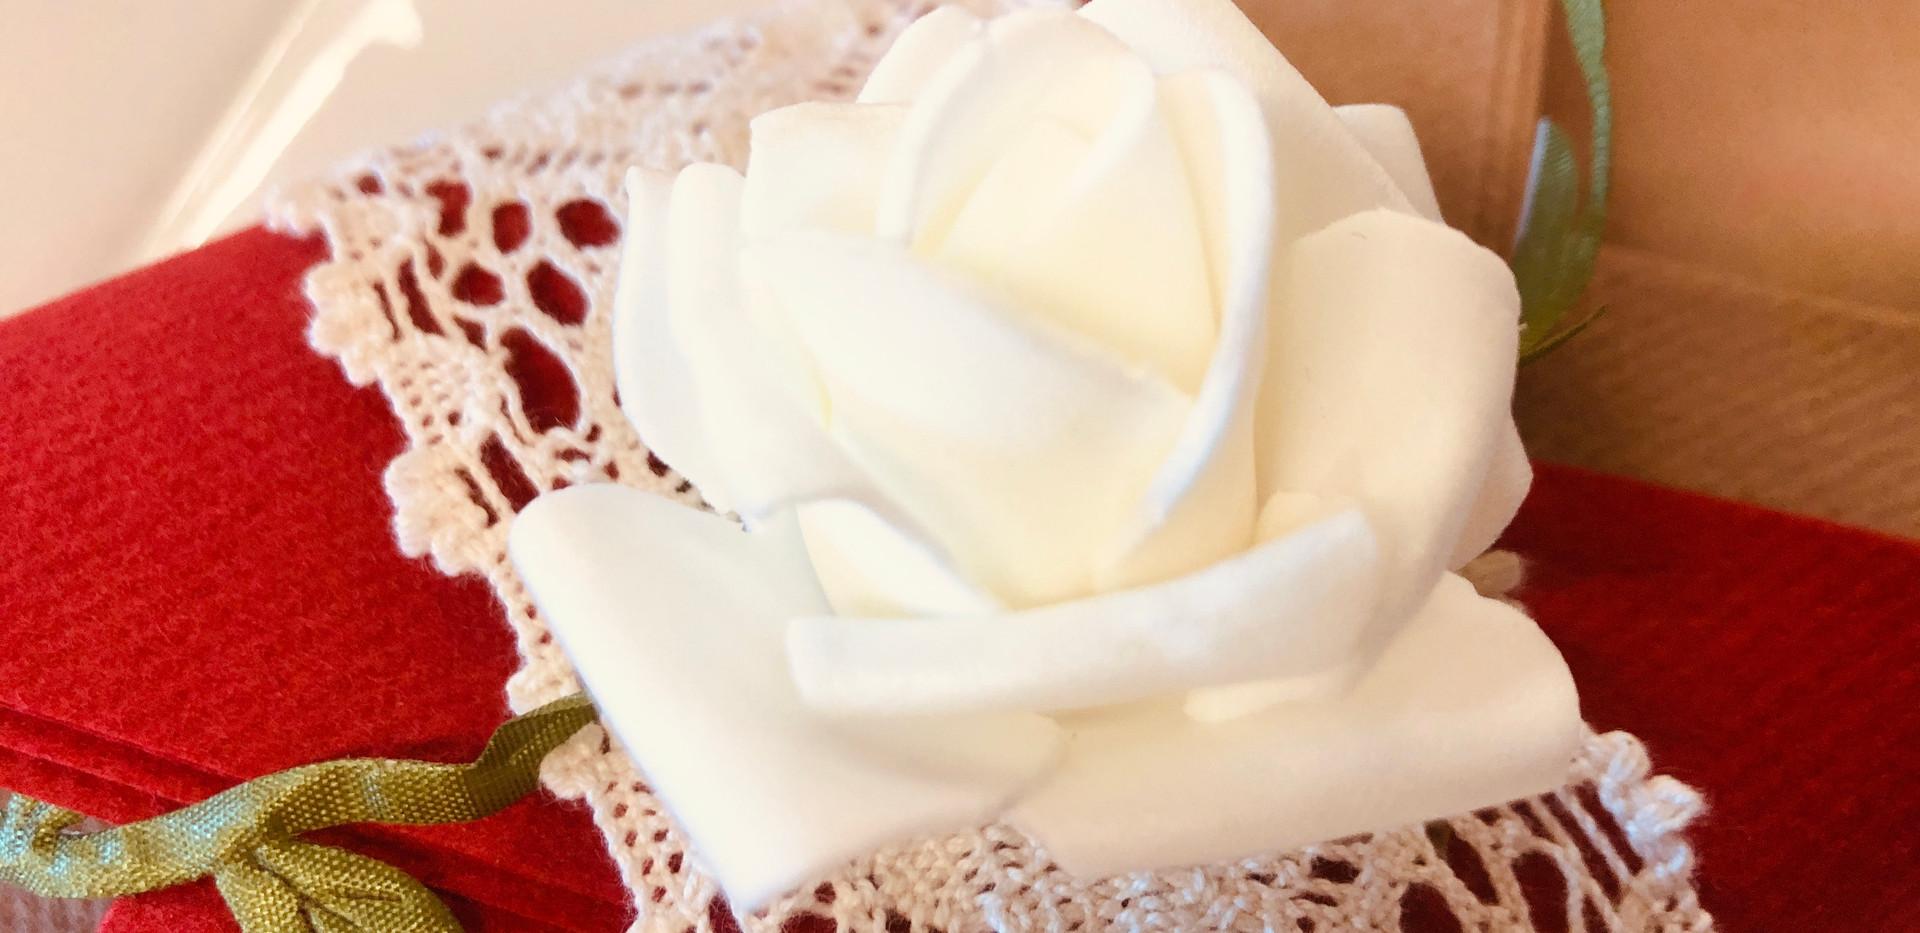 Tête de roses en mousse.JPG